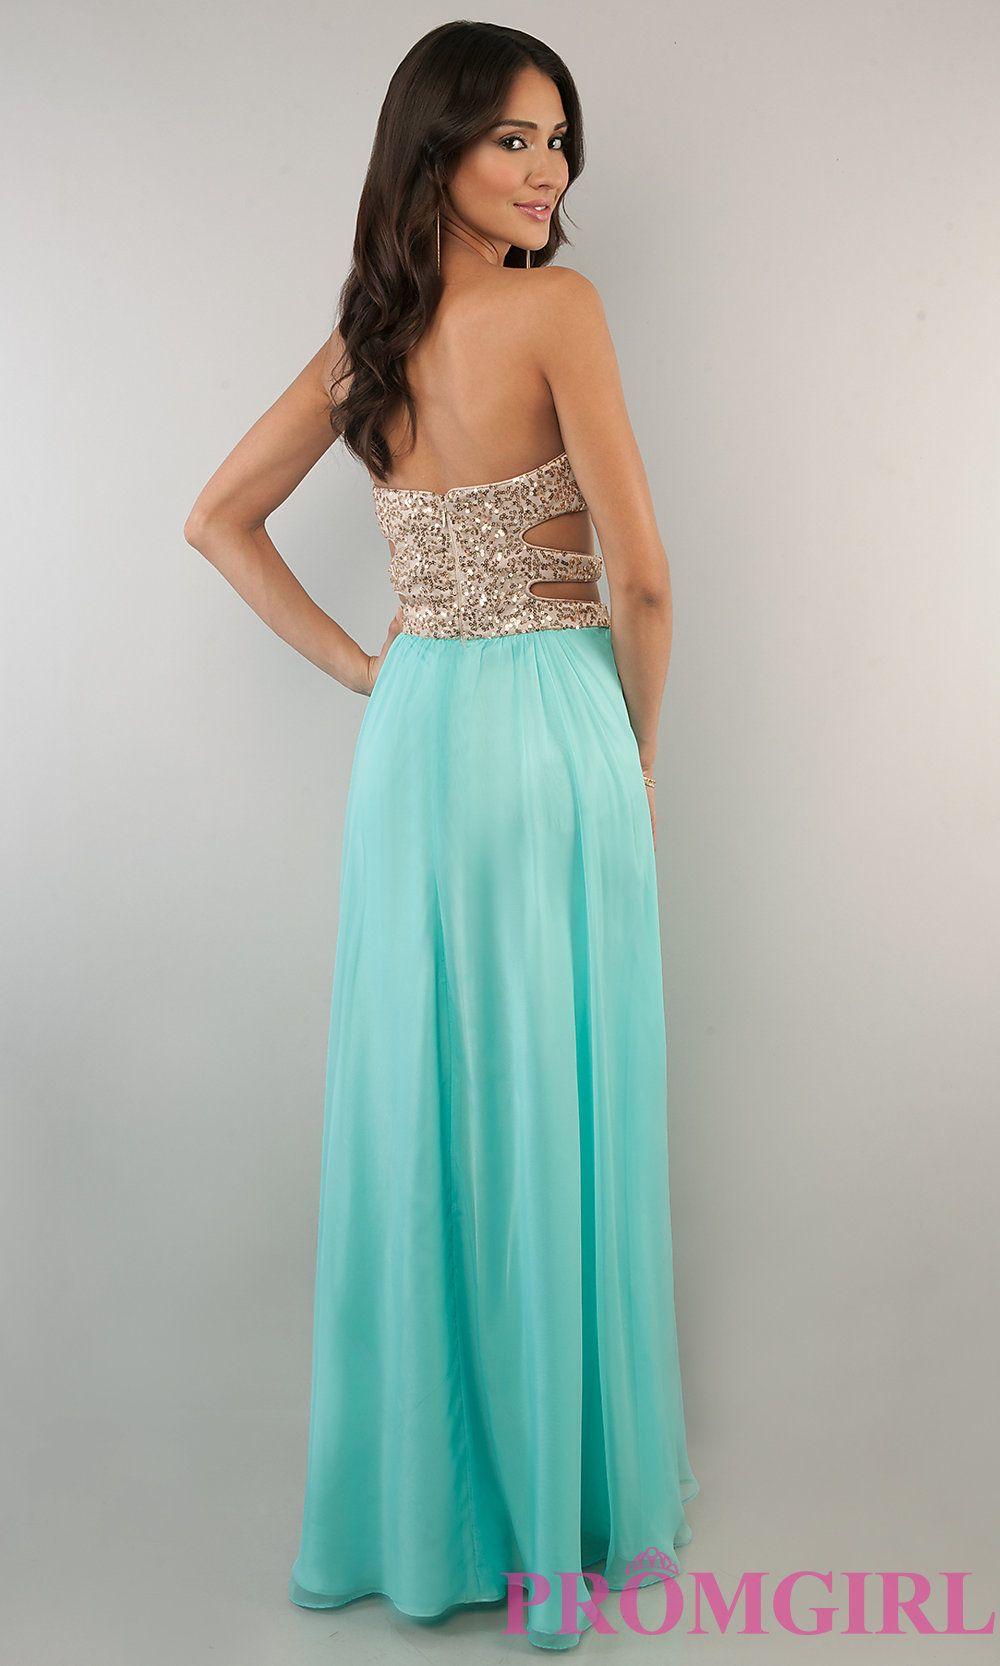 78 Best images about dresses on Pinterest - Long prom dresses ...